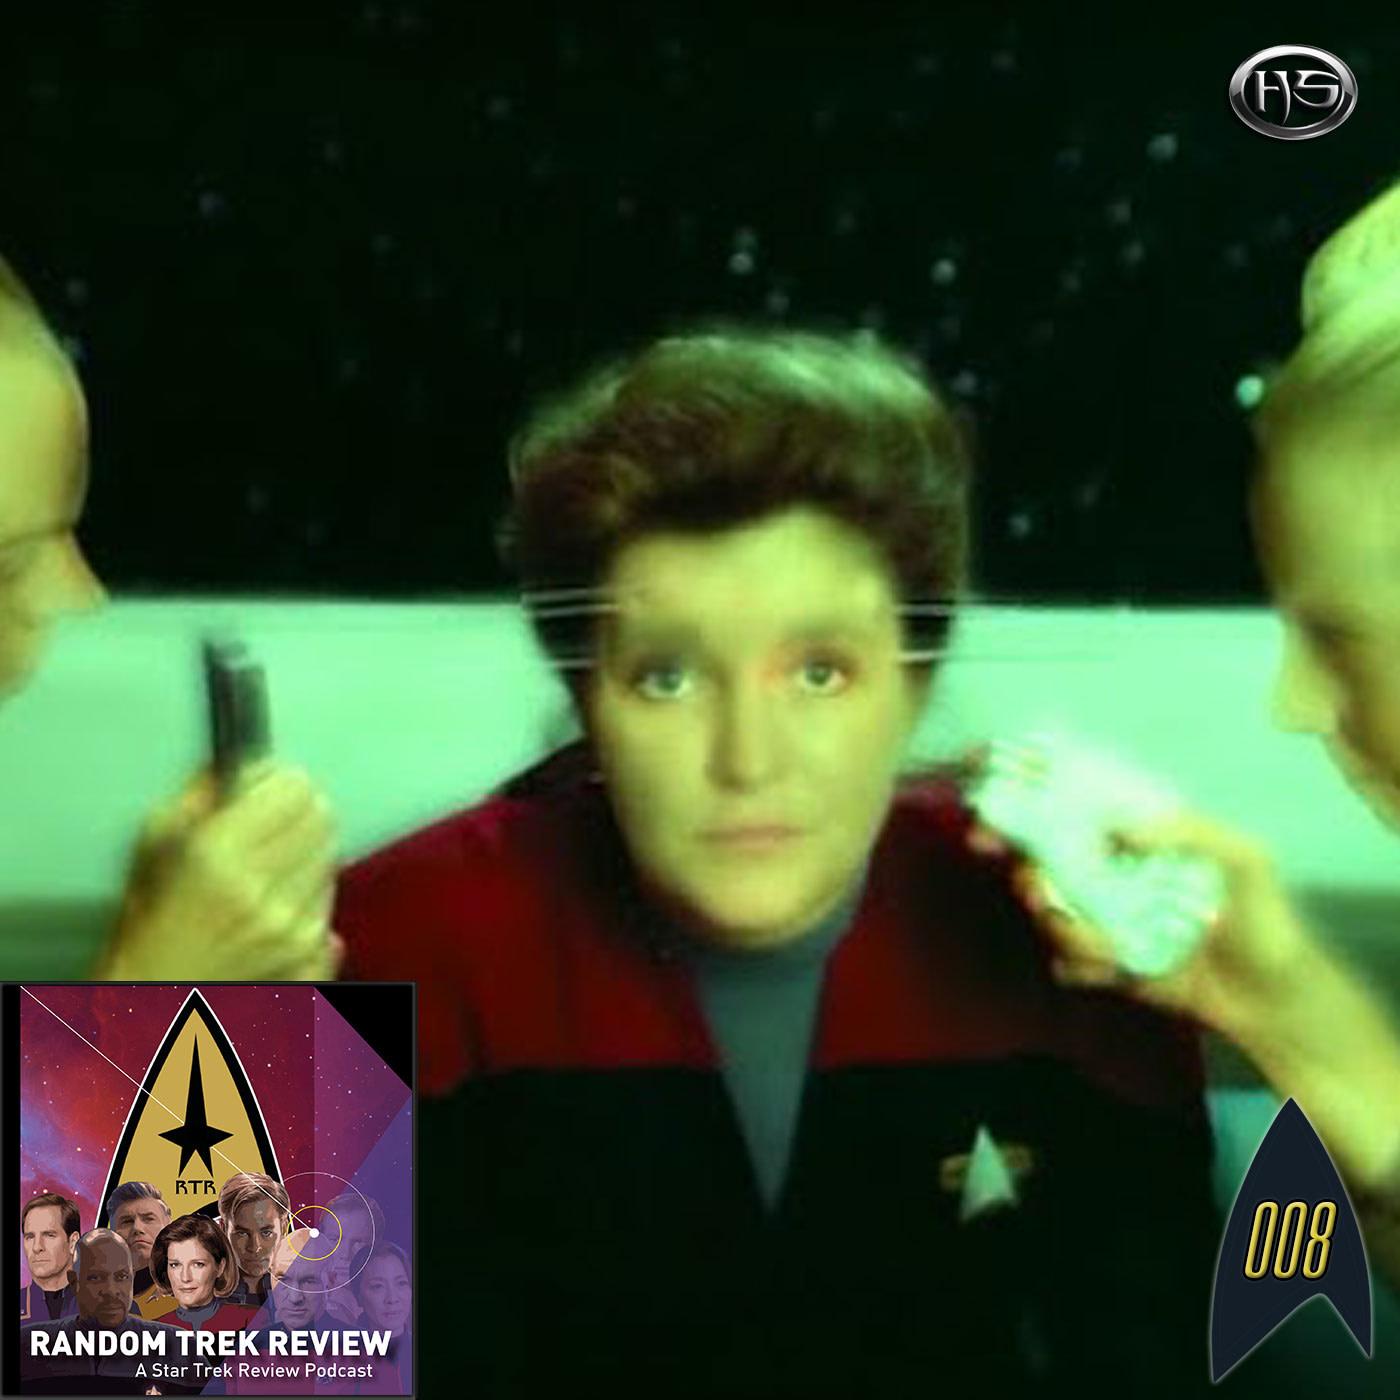 Random Trek Review Episode 8